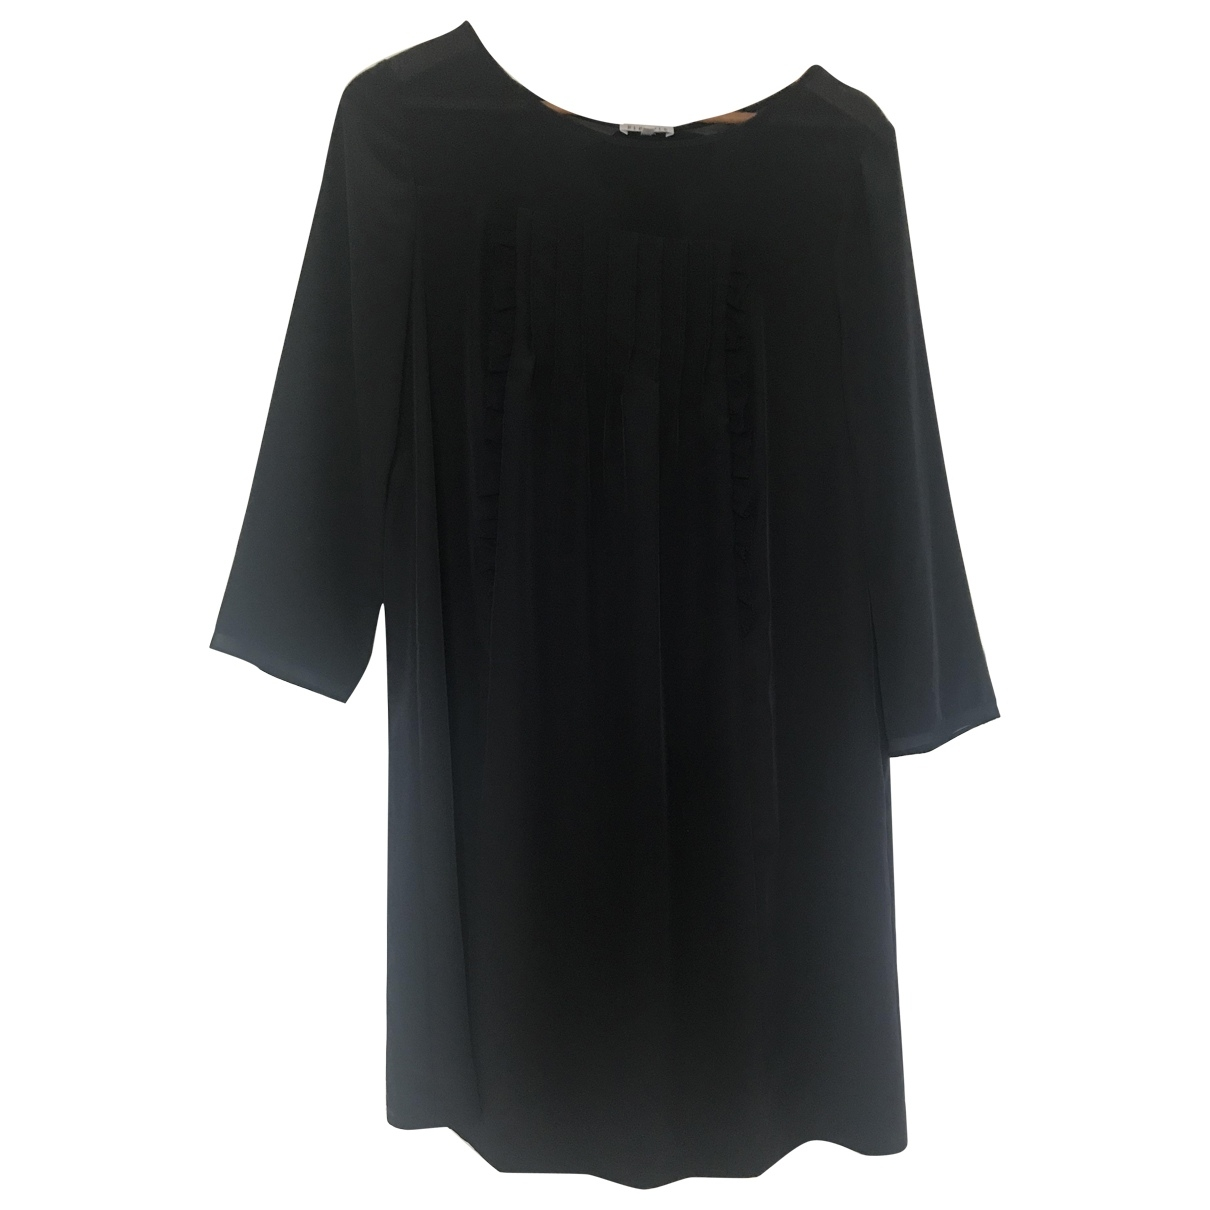 Claudie Pierlot \N Navy dress for Women 40 FR